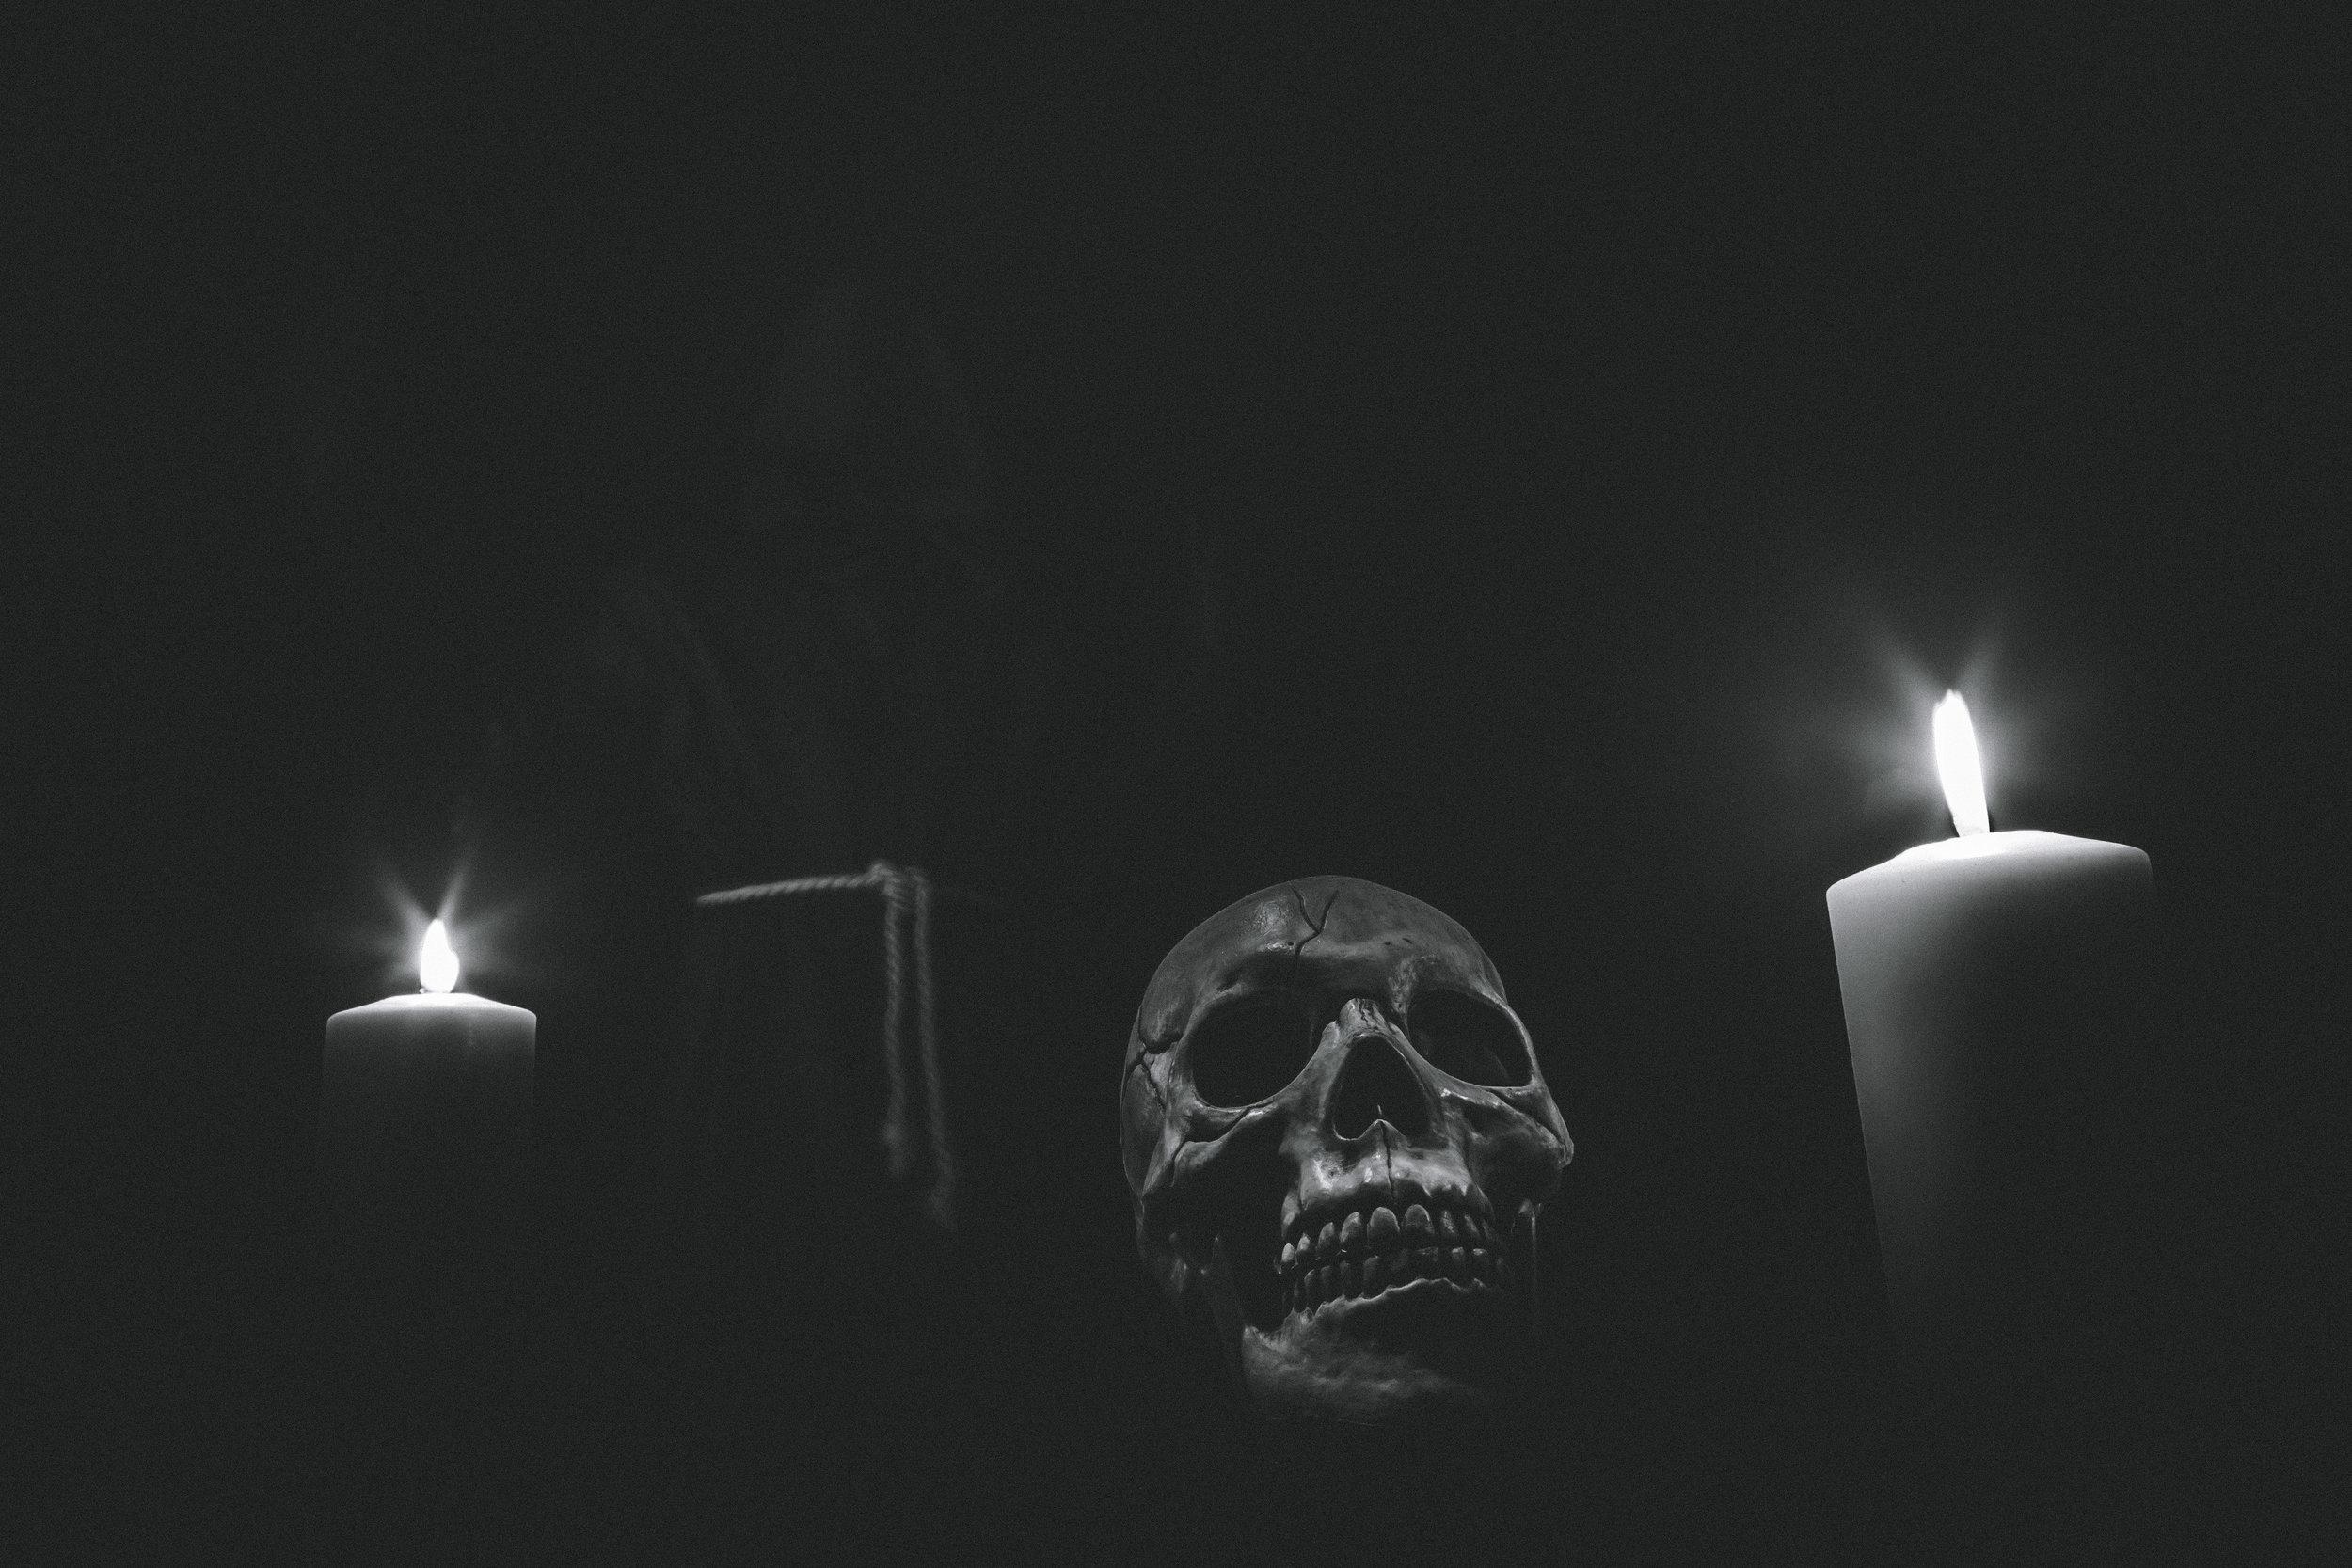 scary-026.jpg